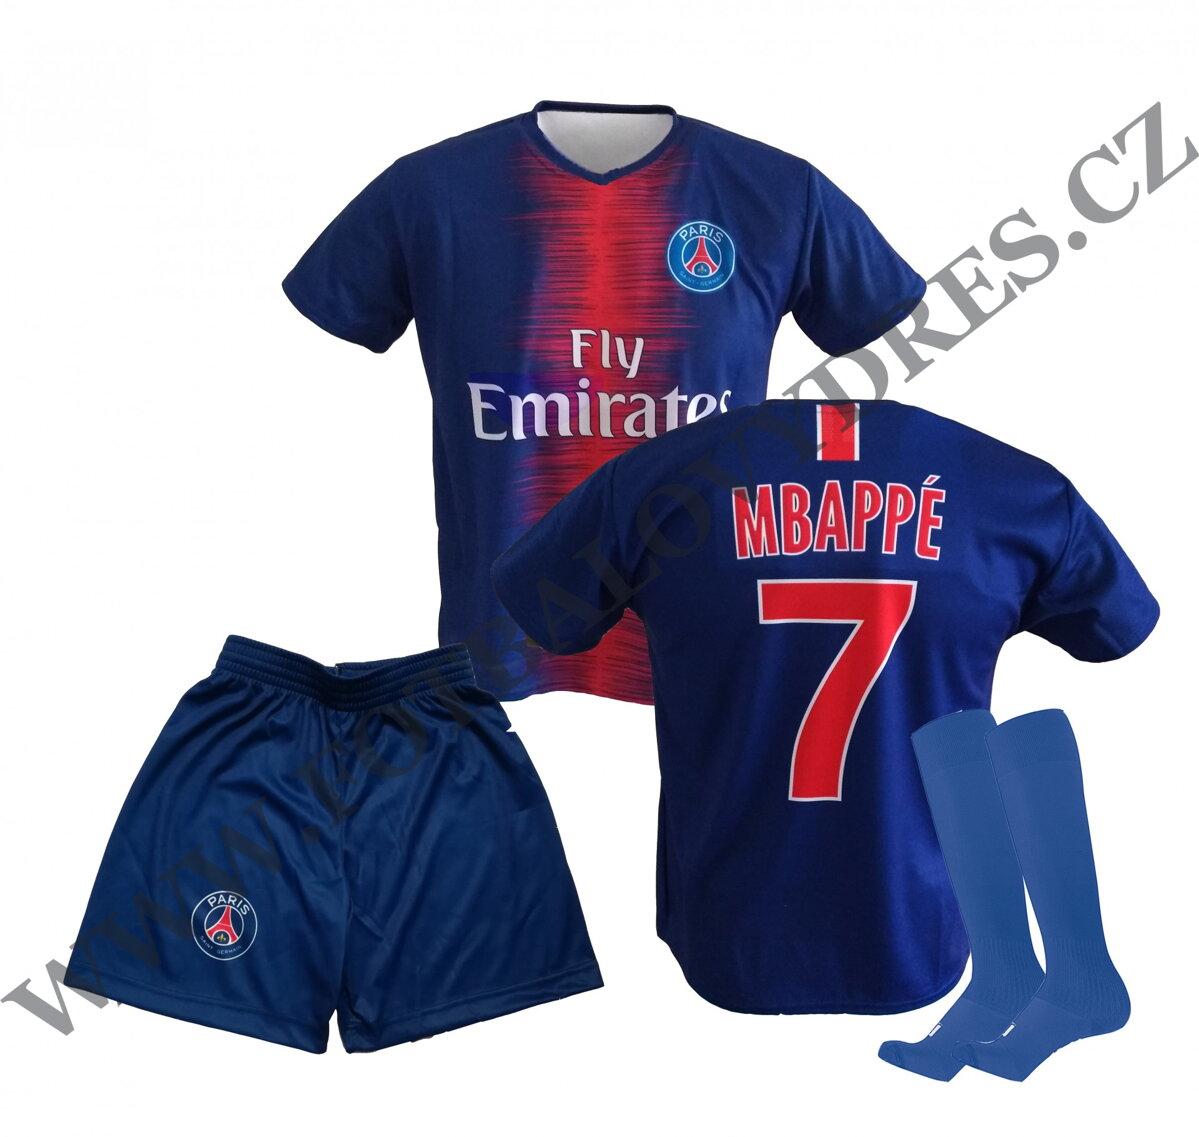 7b9f46b46 MBAPPE fotbalový A3 komplet PSG (dres + trenýrky + štulpny)